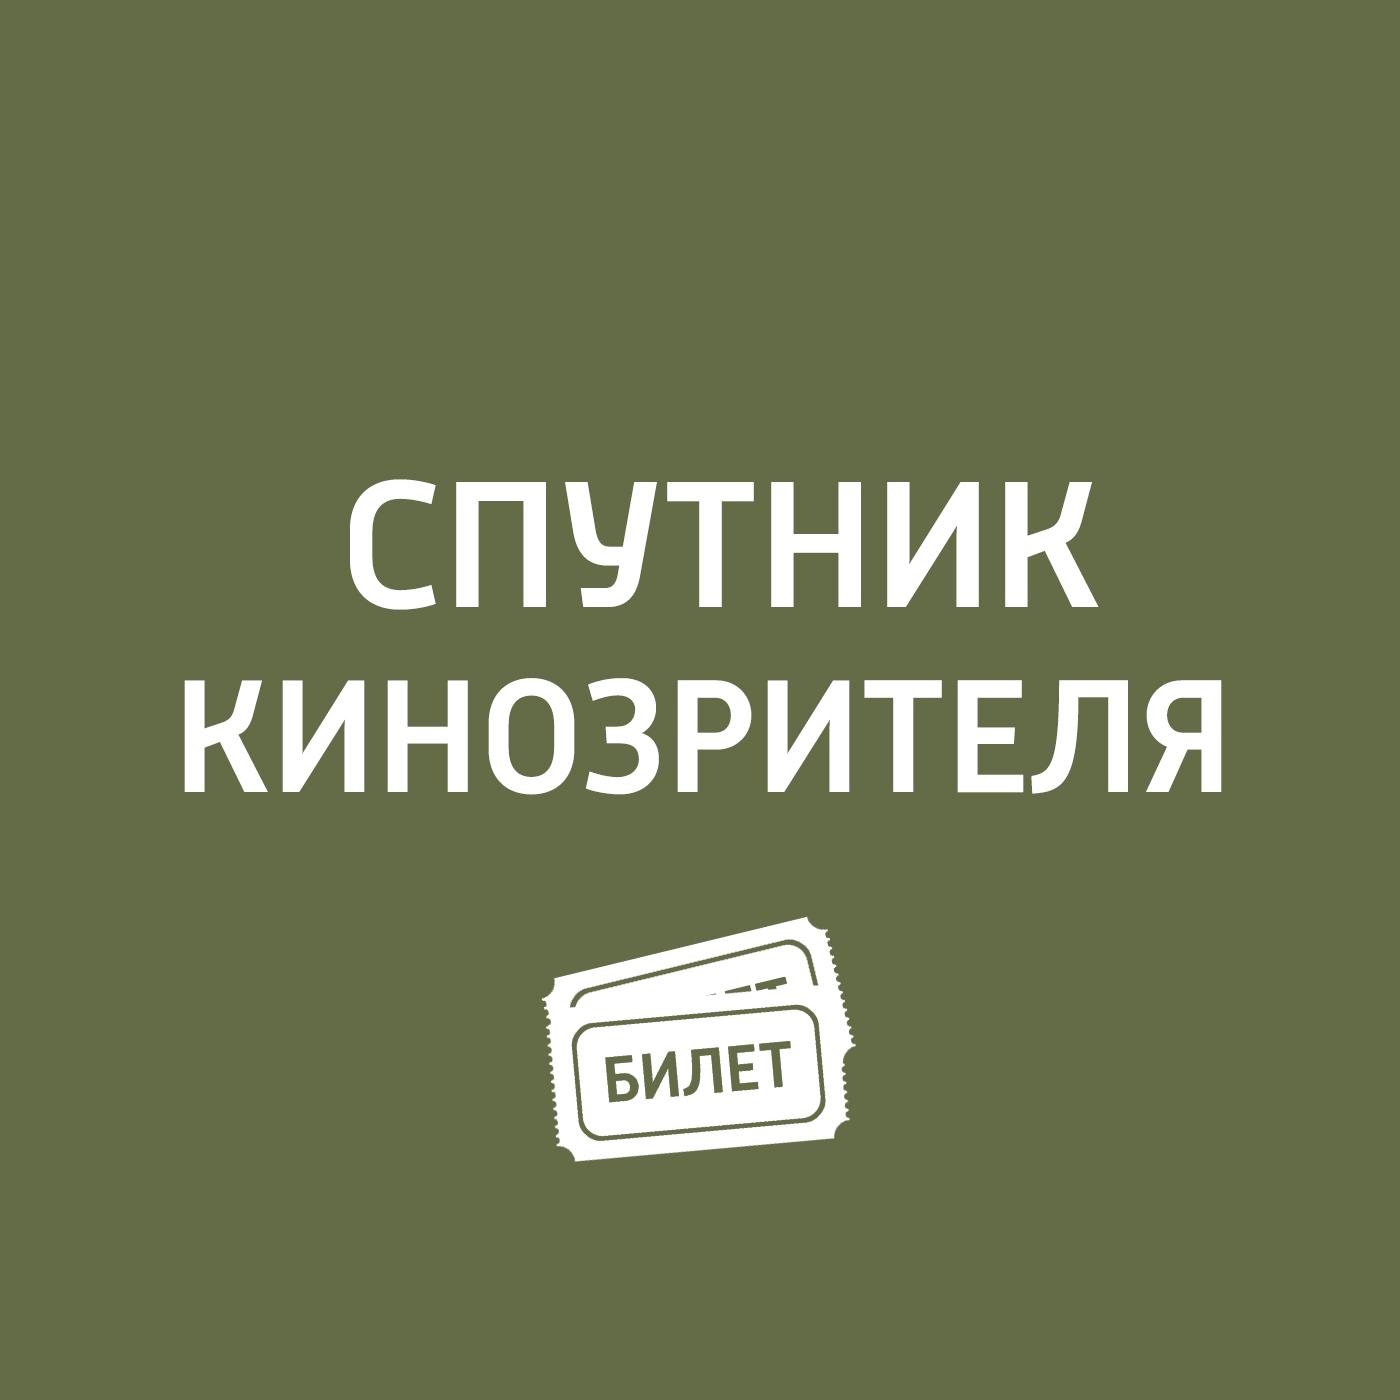 Антон Долин Курьер из «Рая, «Шоппинг-тур, «Каньоны тур найк французское порно шоу